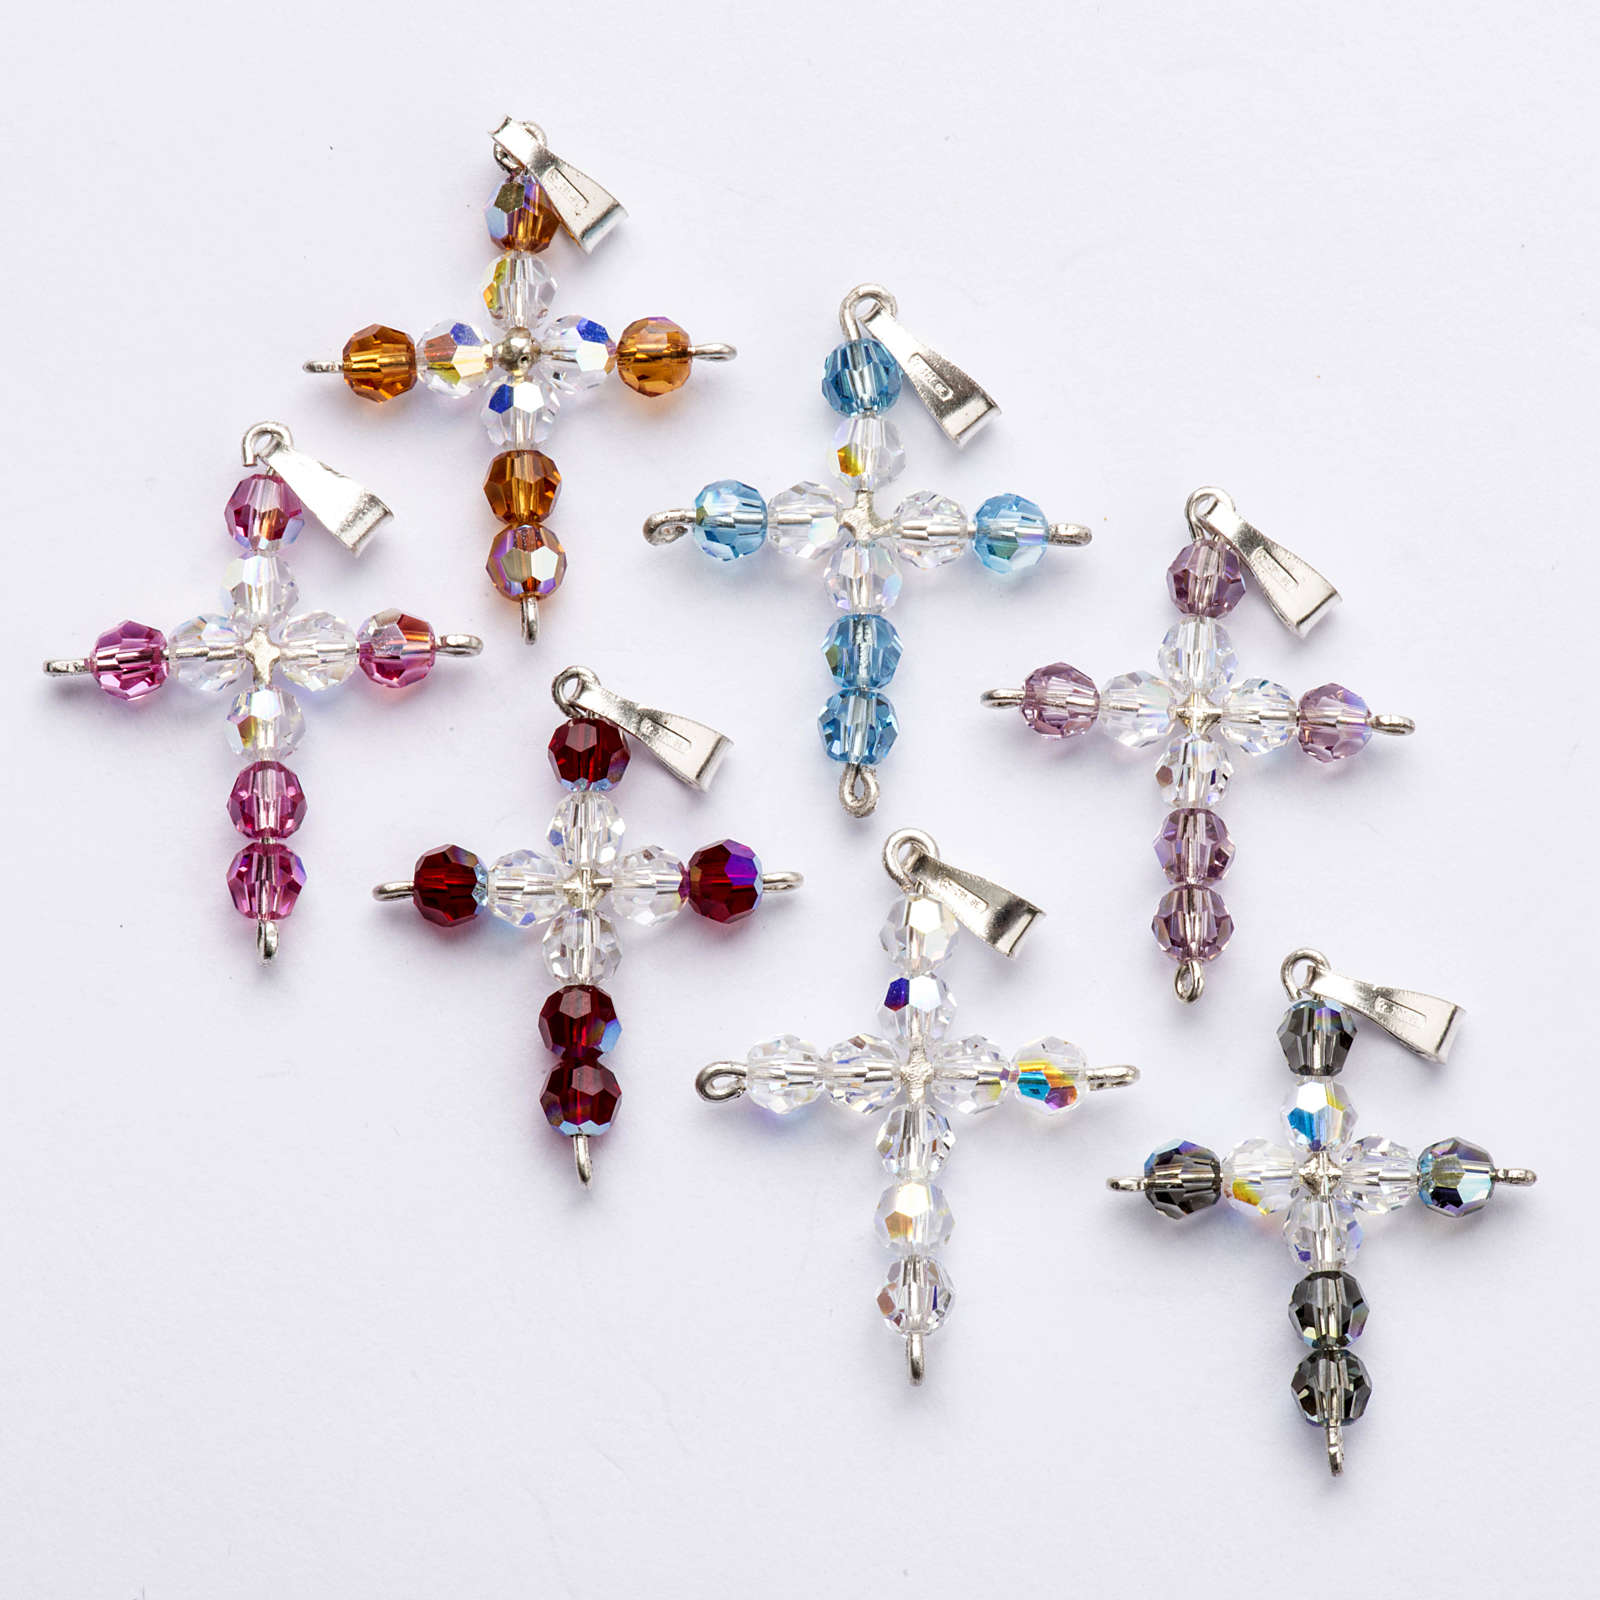 Pendant cross, round Swarovski crystal 4